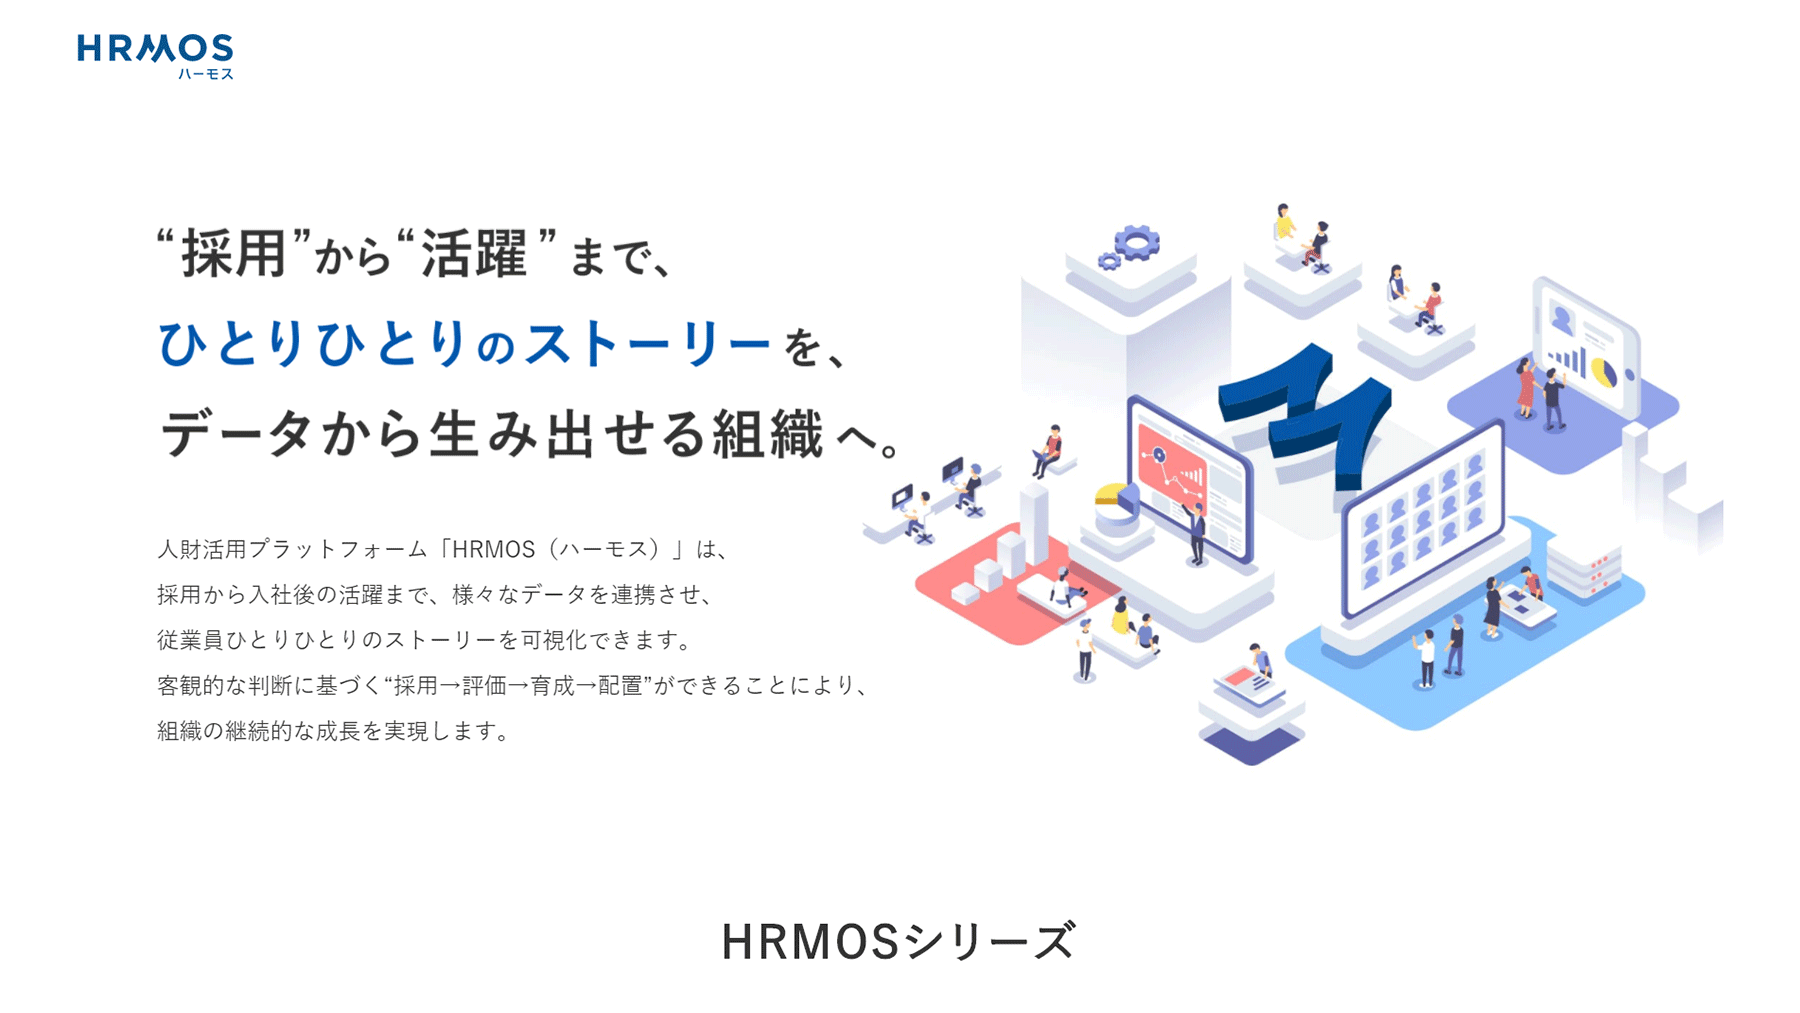 HRMOS評価公式Webサイト